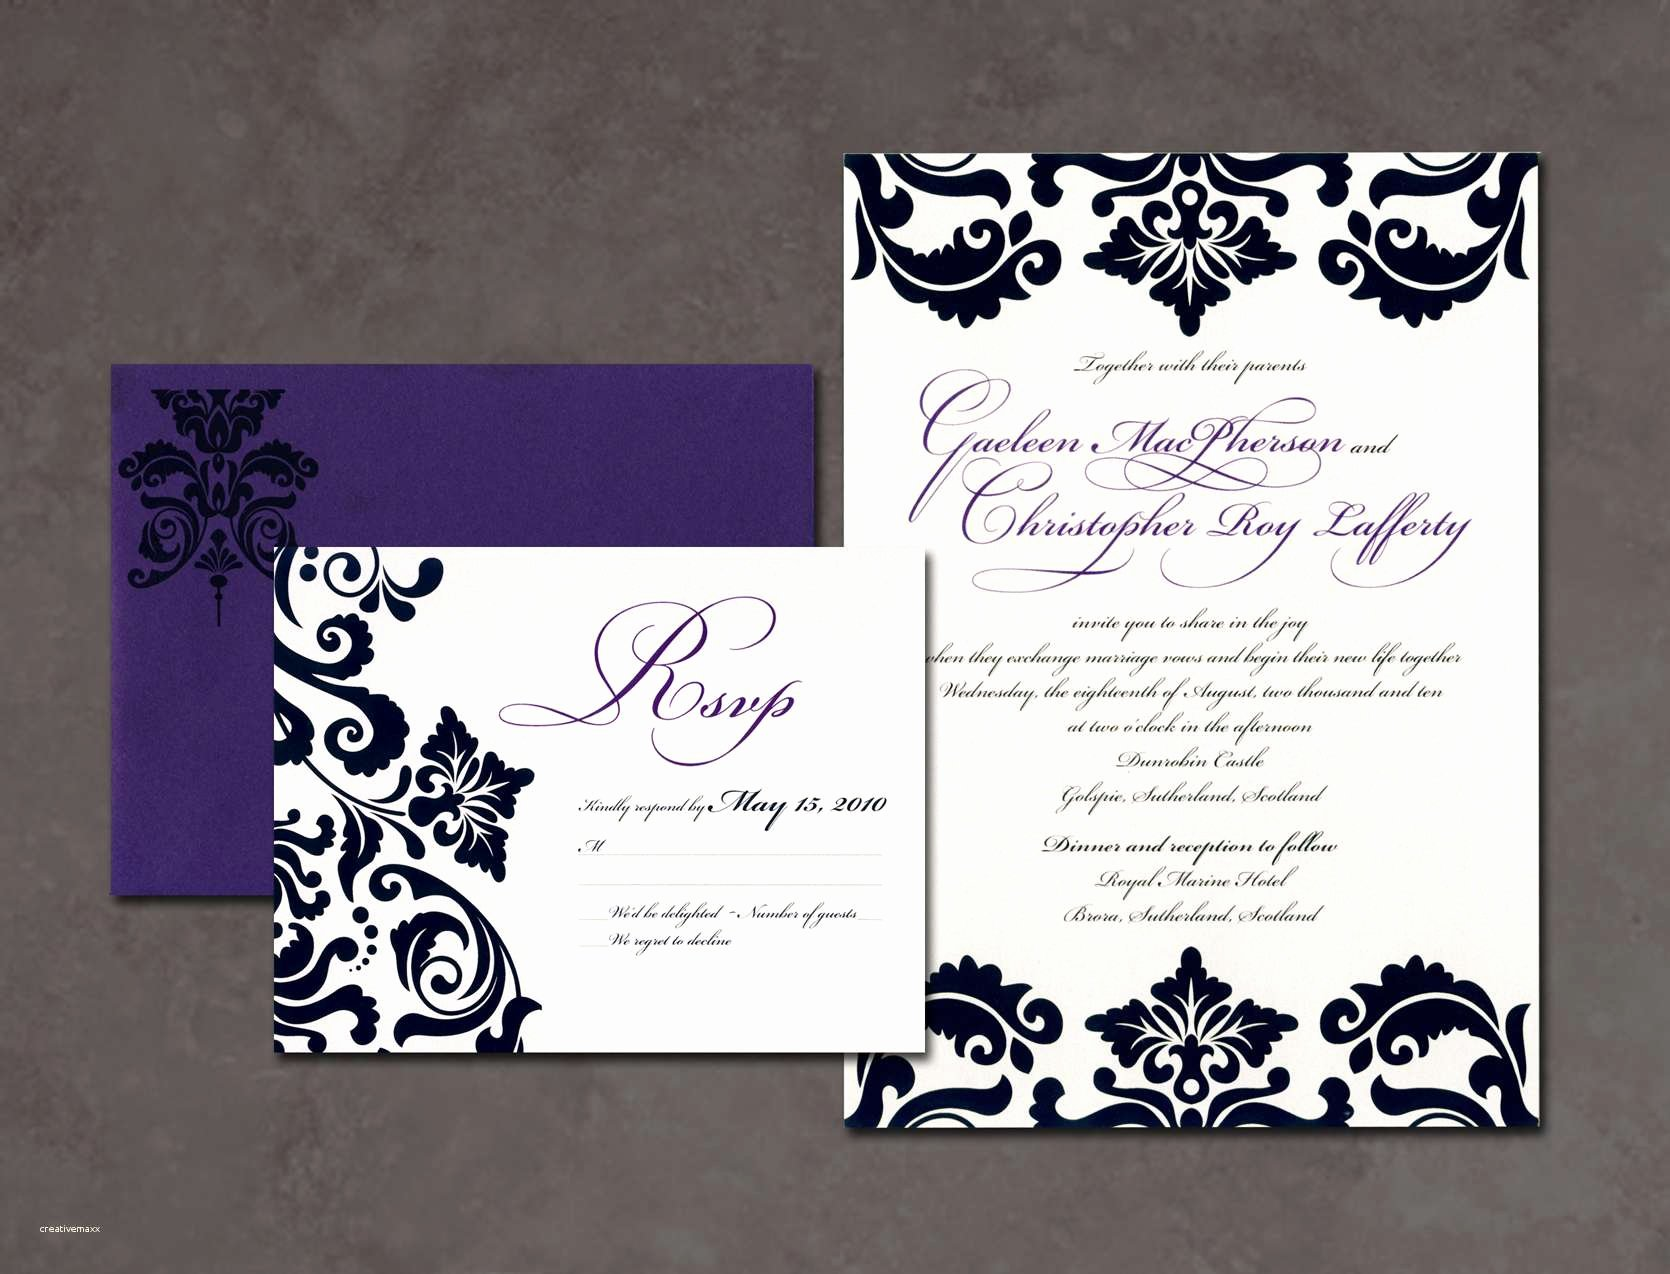 Wedding Invitations Word Template Luxury Luxury Blank Wedding Invitation Templates for Microsoft